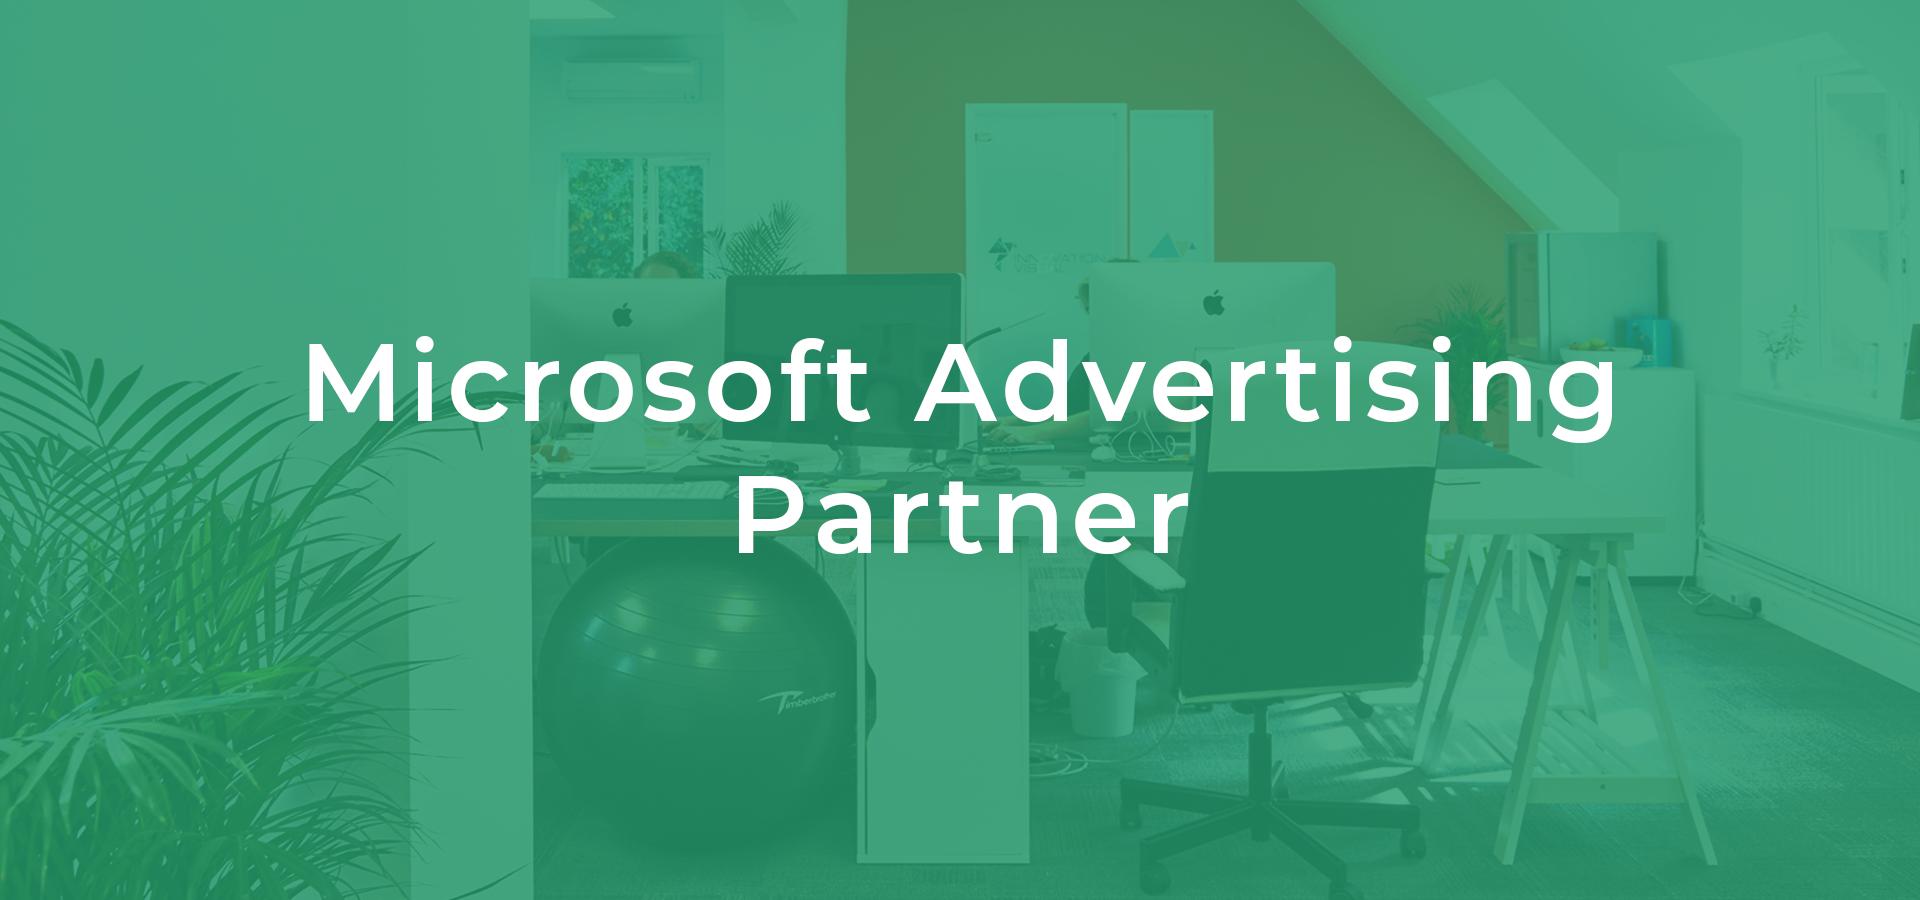 Innovation-Visual-Microsoft-Advertising-Partner-Banner